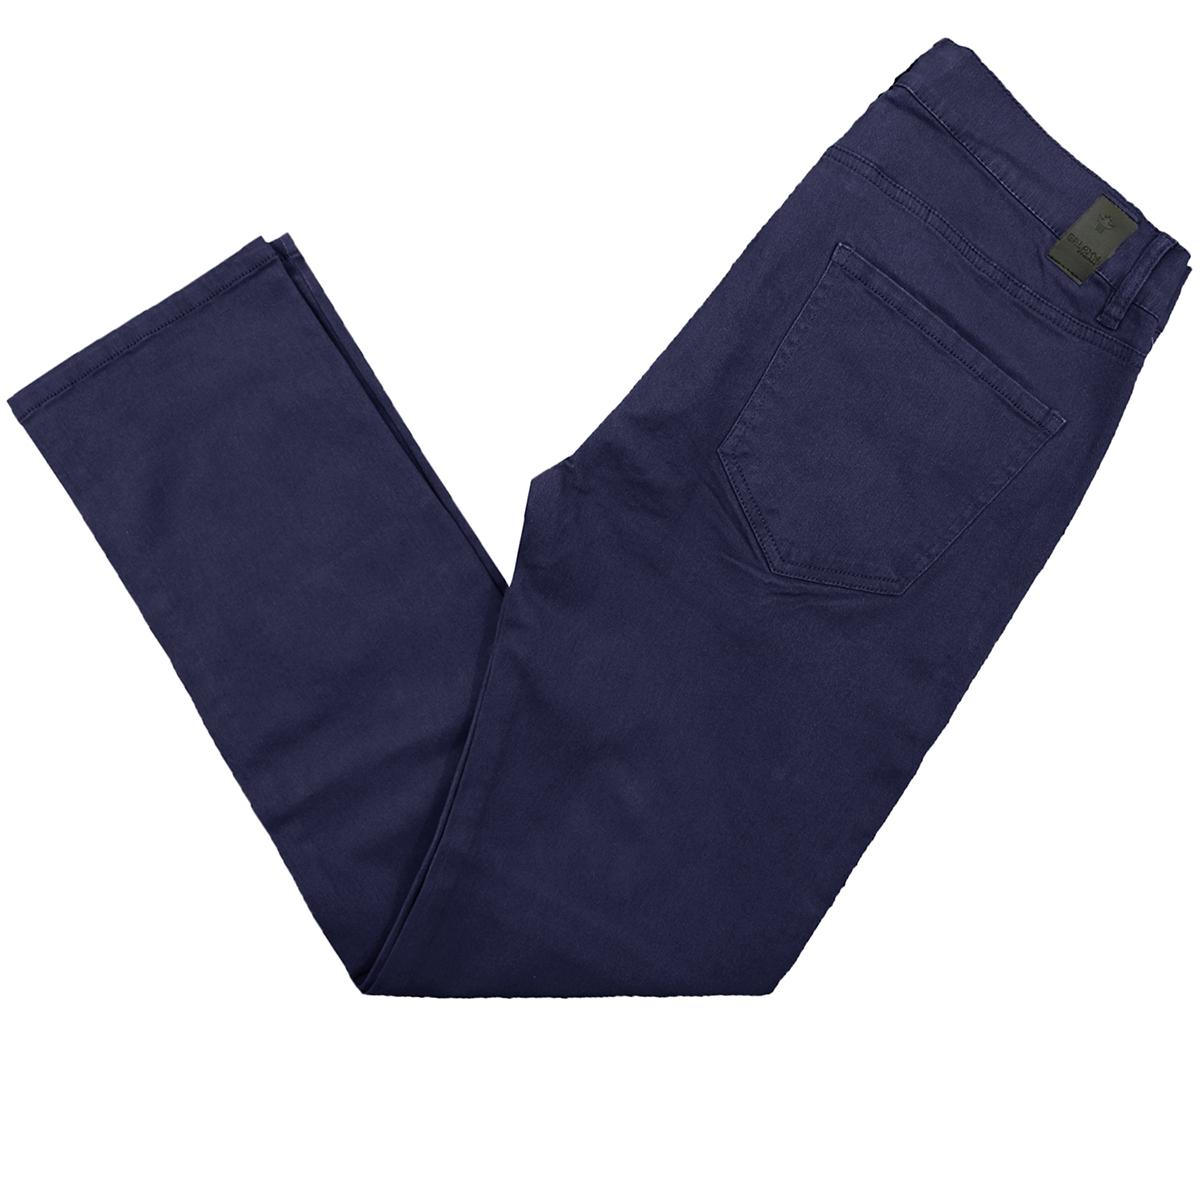 Men/'s 5-Pocket Ultra-Stretch Skinny-Fit Chino Pants